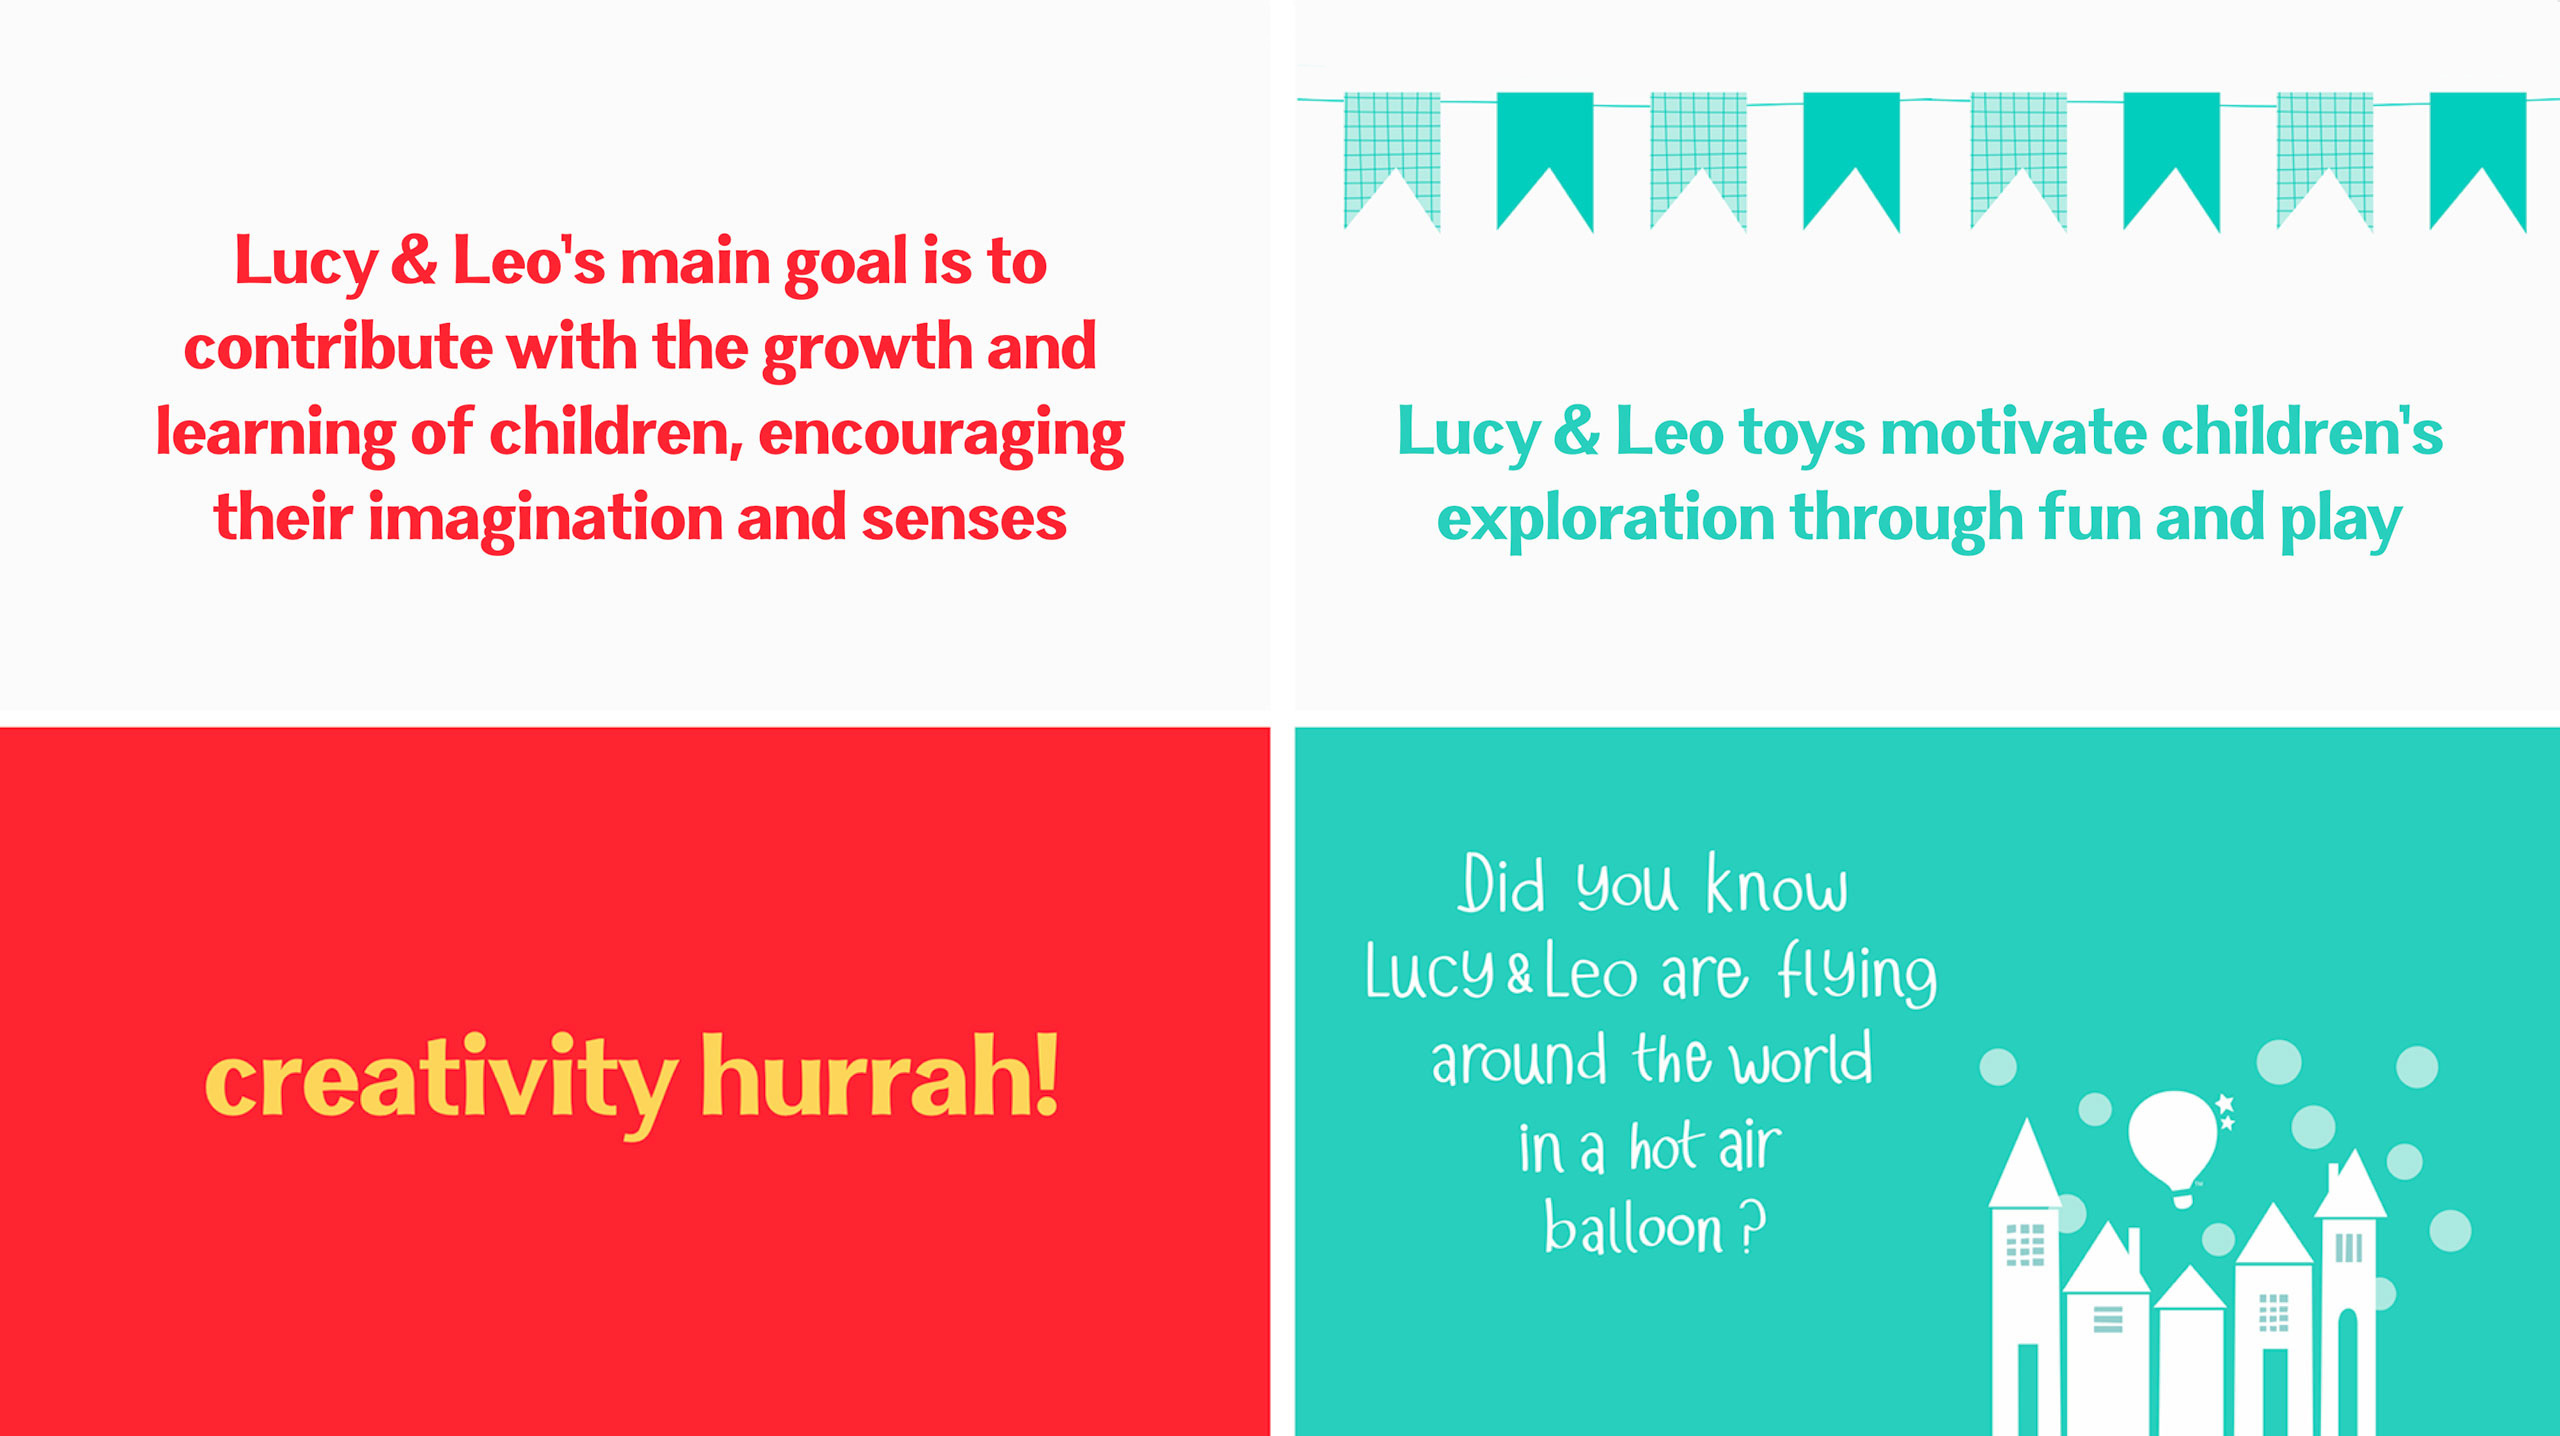 LucyLeo-Narrative